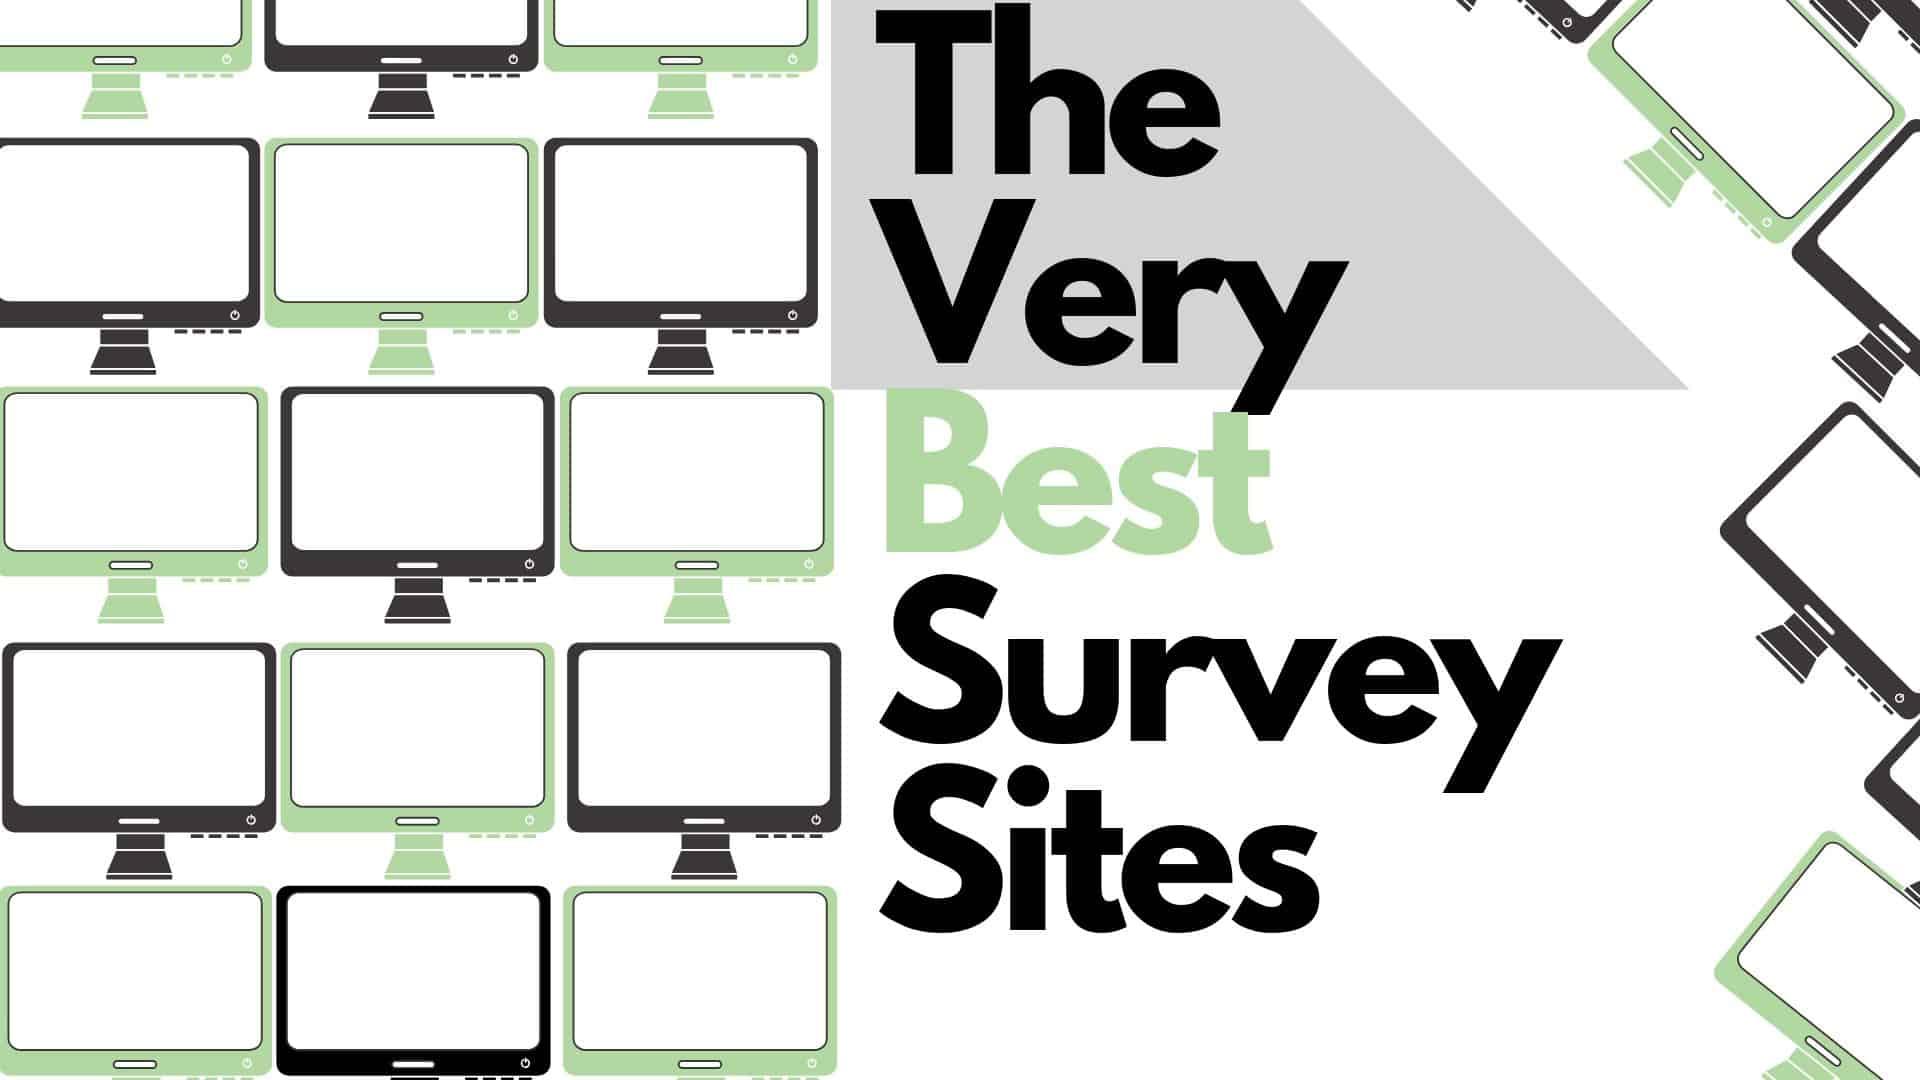 The very best survey sites